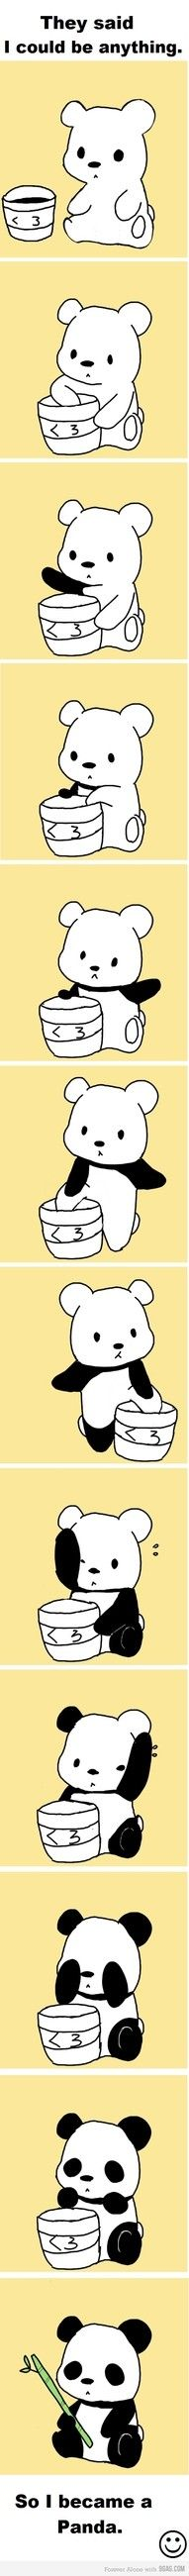 lil panda bear, panda bears' are rare. i love you, yes i do and all the funny things you do, i love you, yes i do.